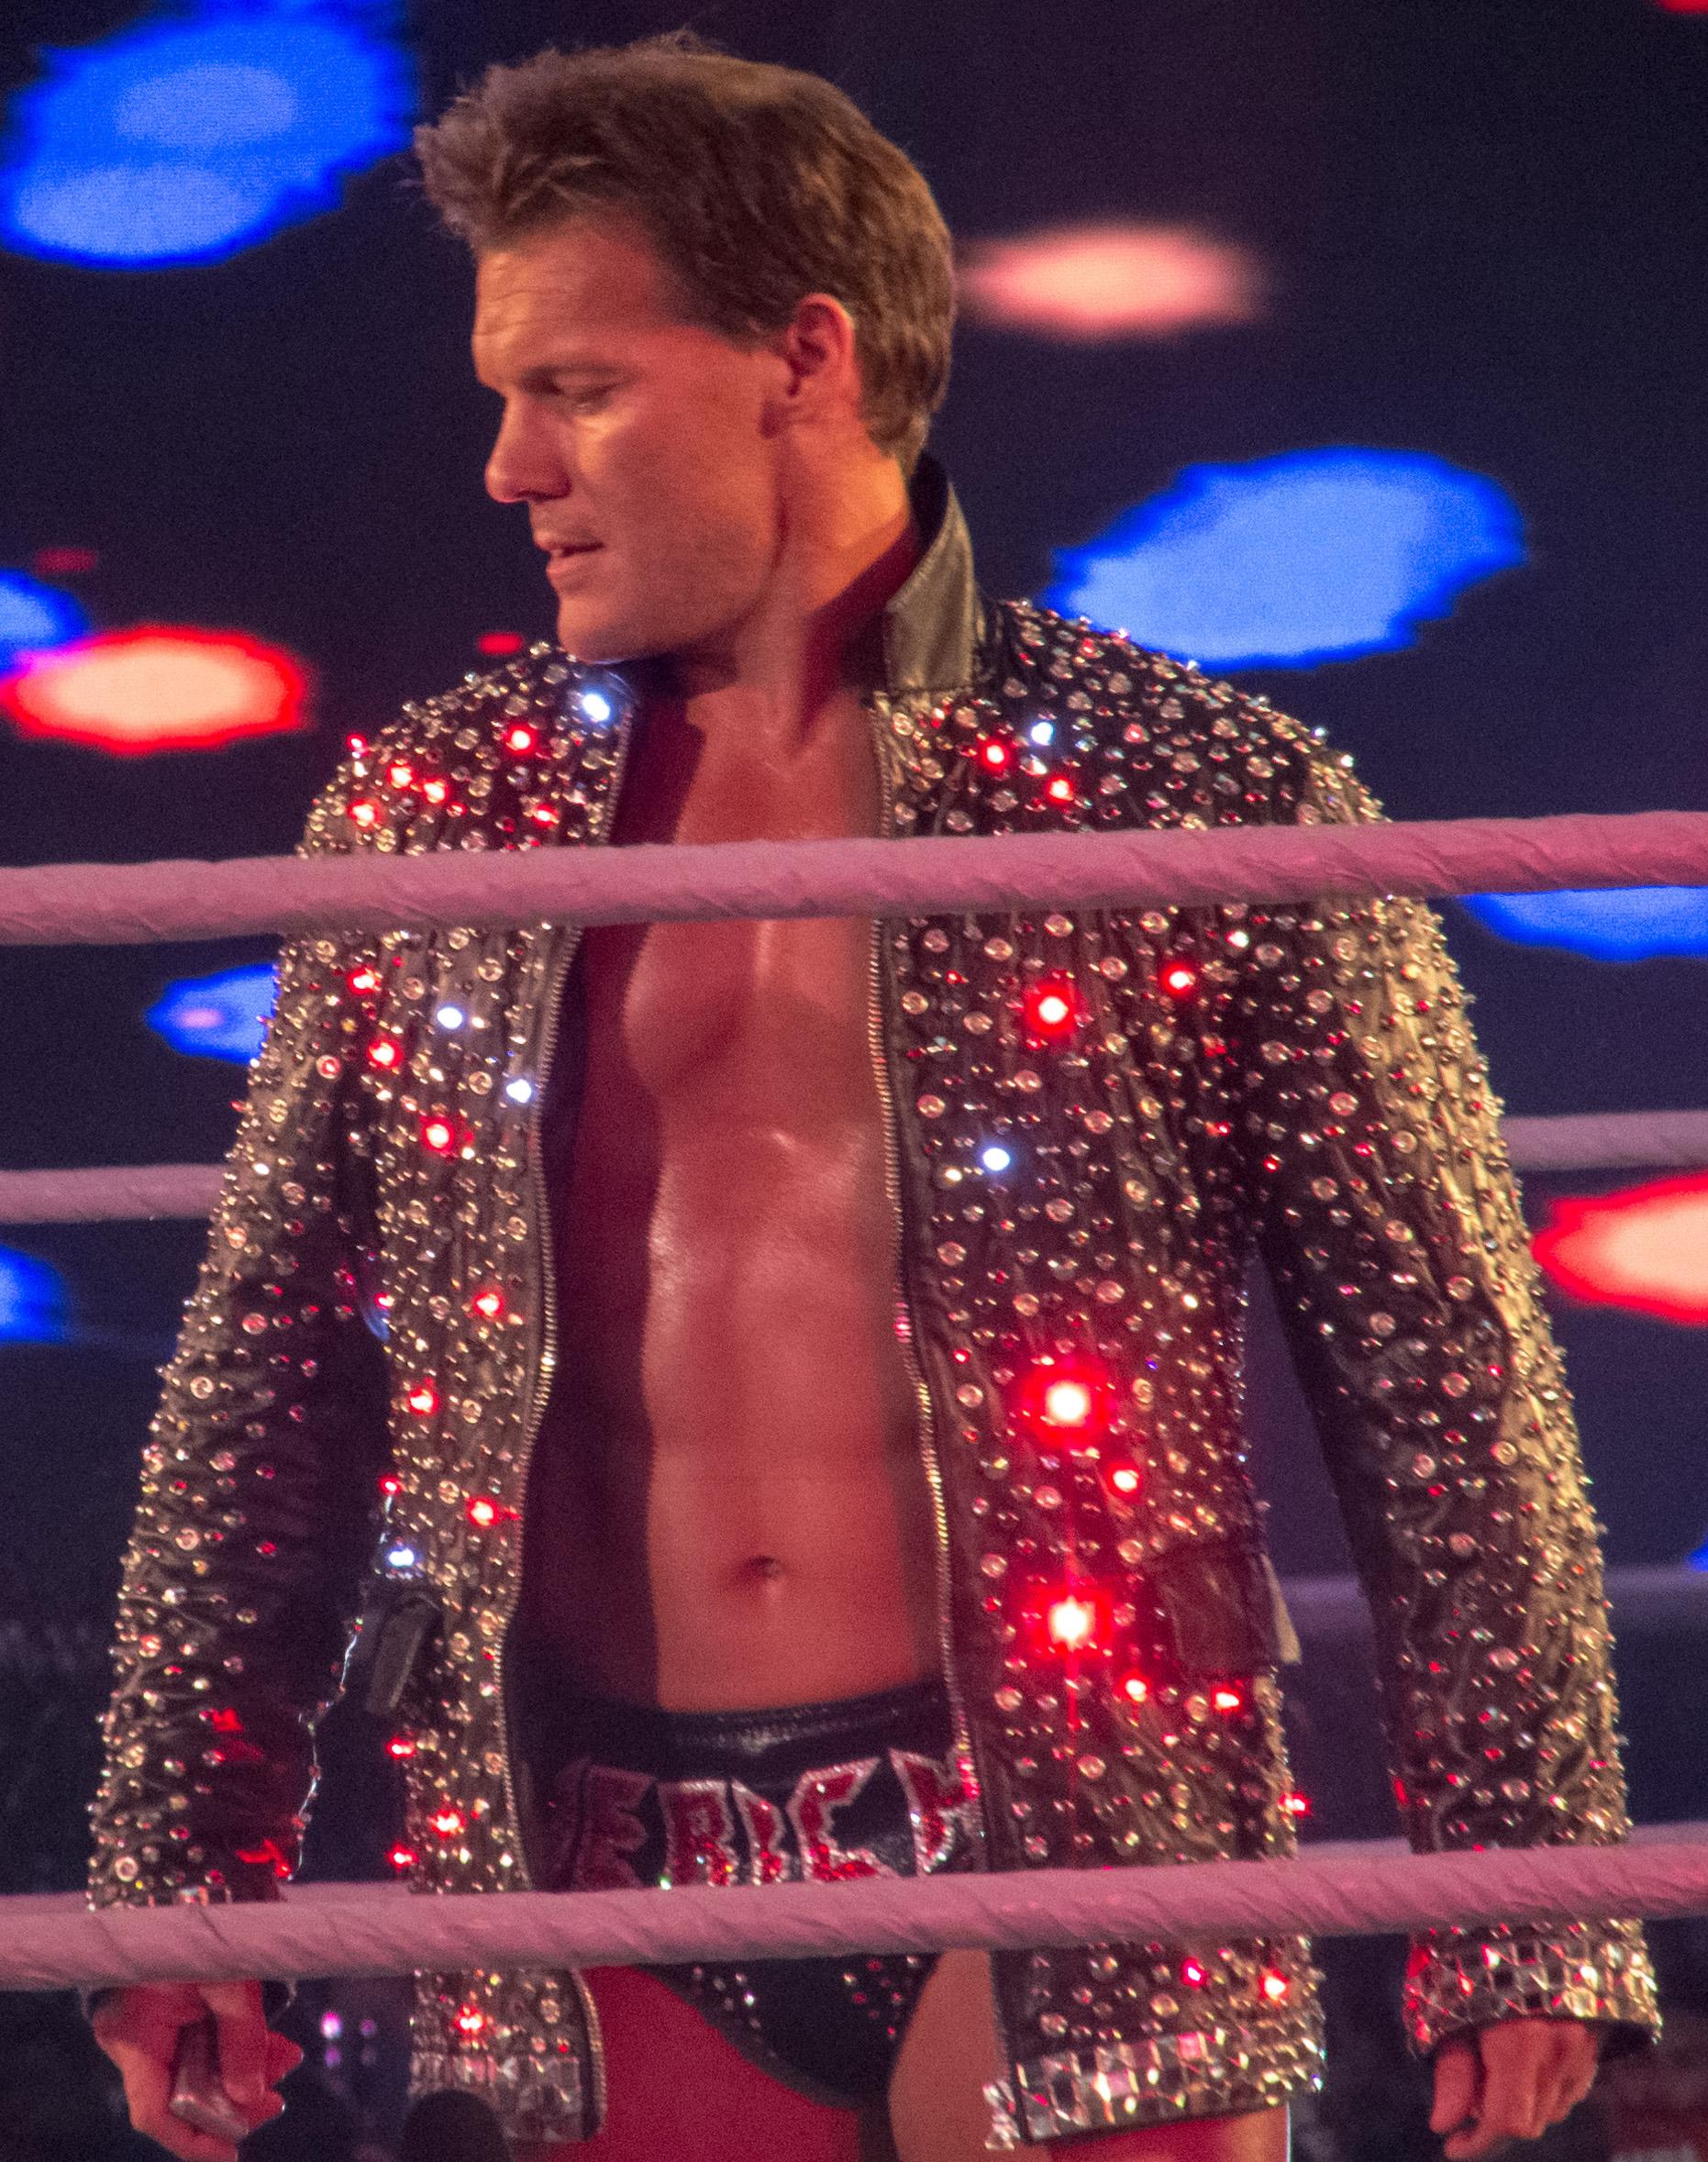 Chris Jericho Entrance Chris-jericho-chris-jericho